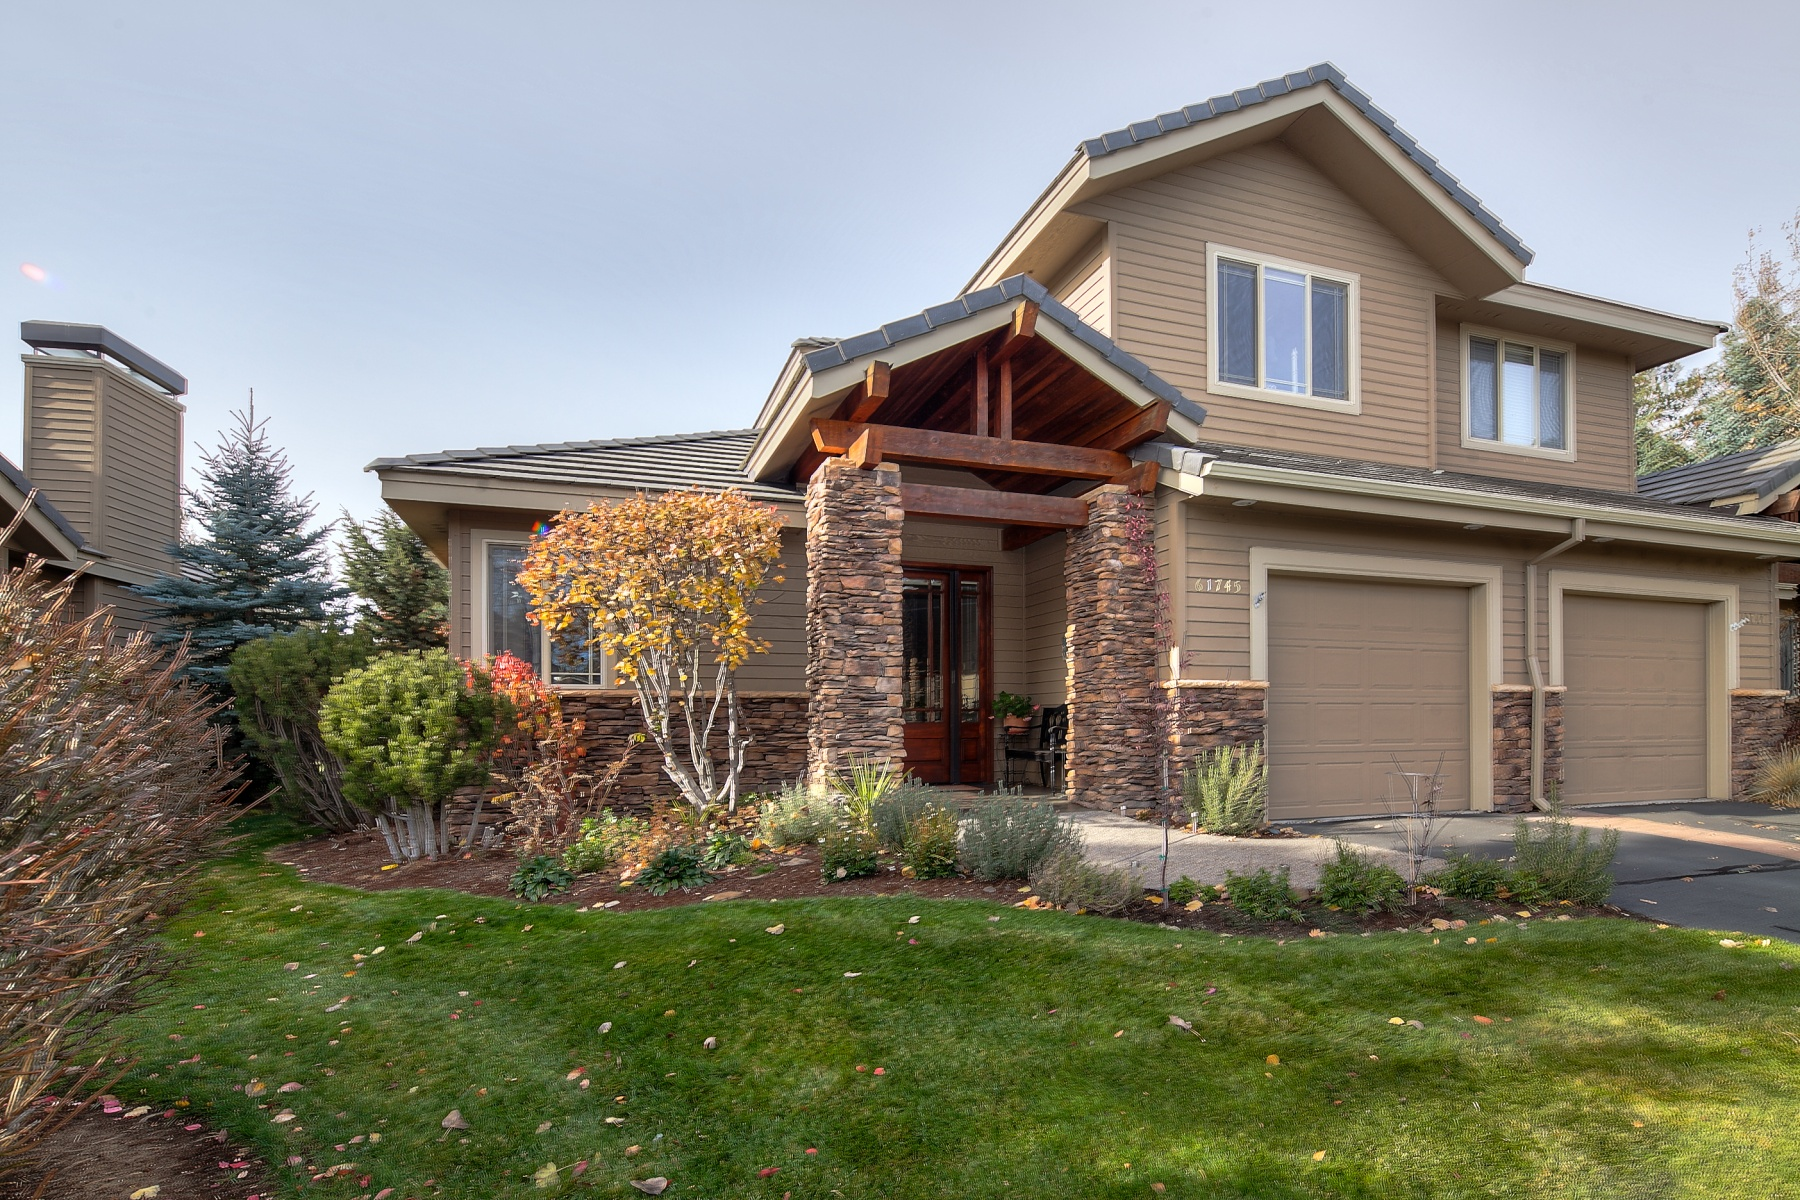 Property For Sale at 61745 Bridge Creek Drive, BEND